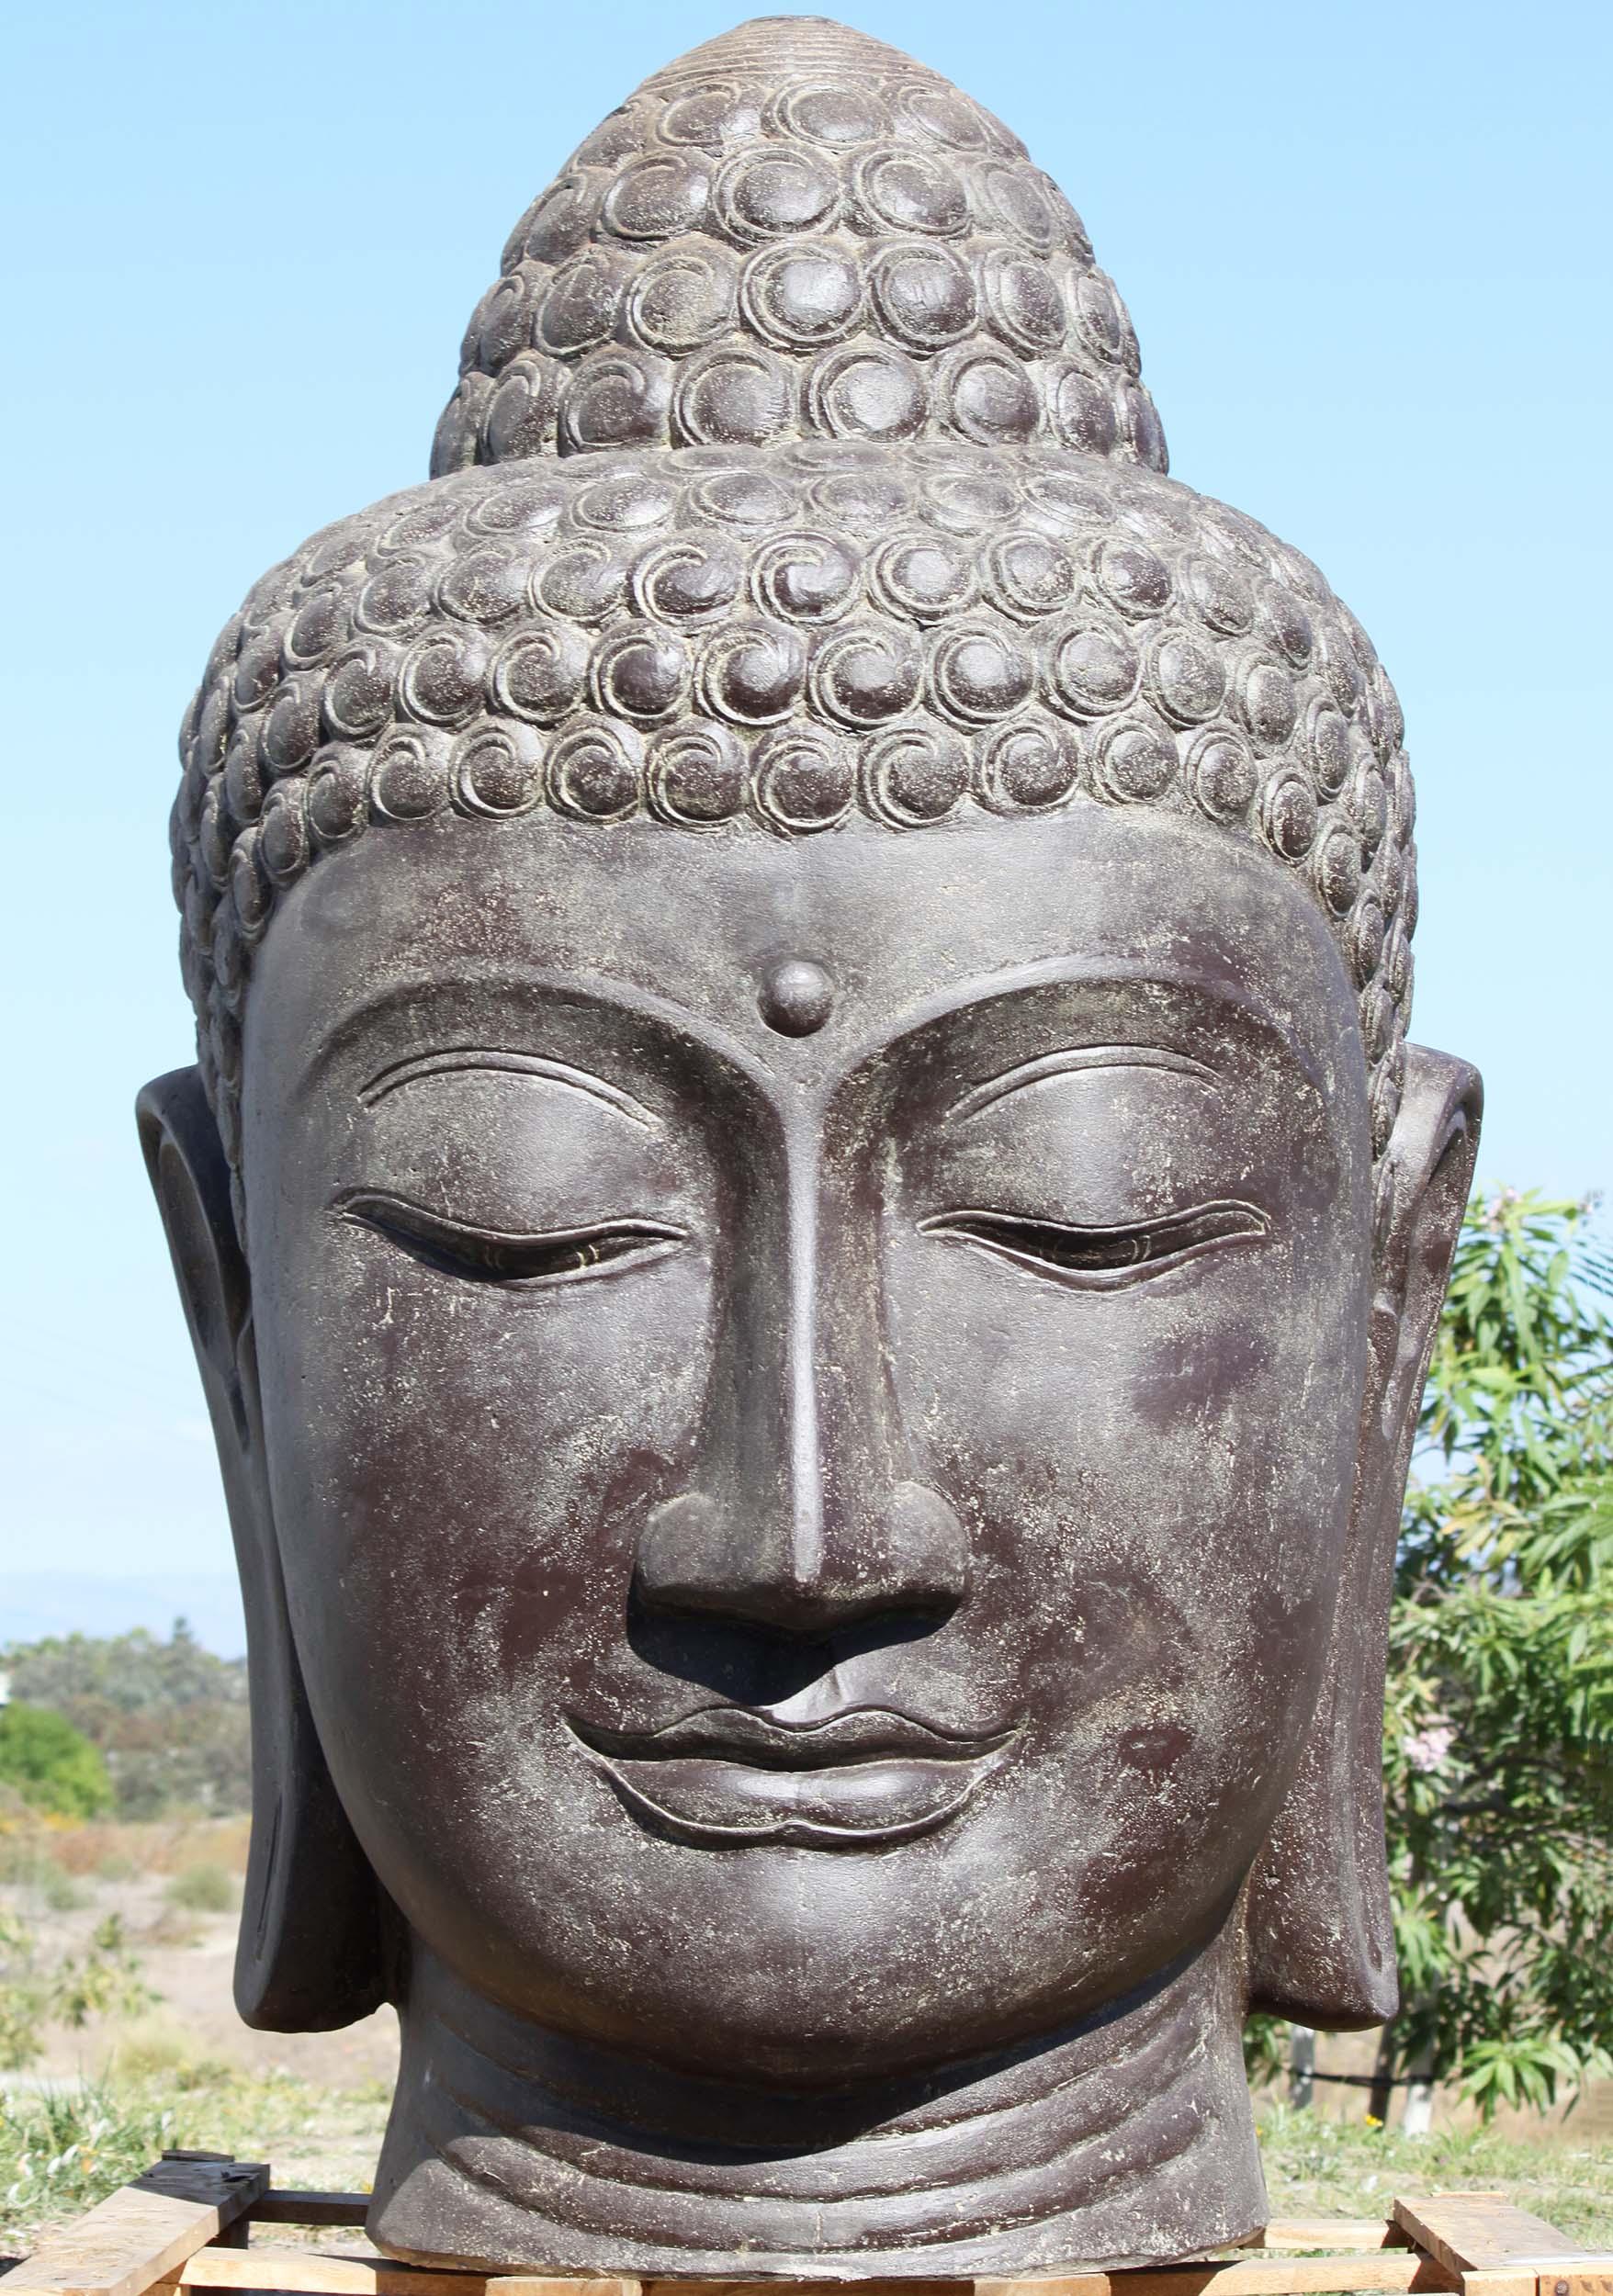 Large Buddha Outdoor Garden Fountain Statue 72 111ls508z Hindu Gods Buddha Statues